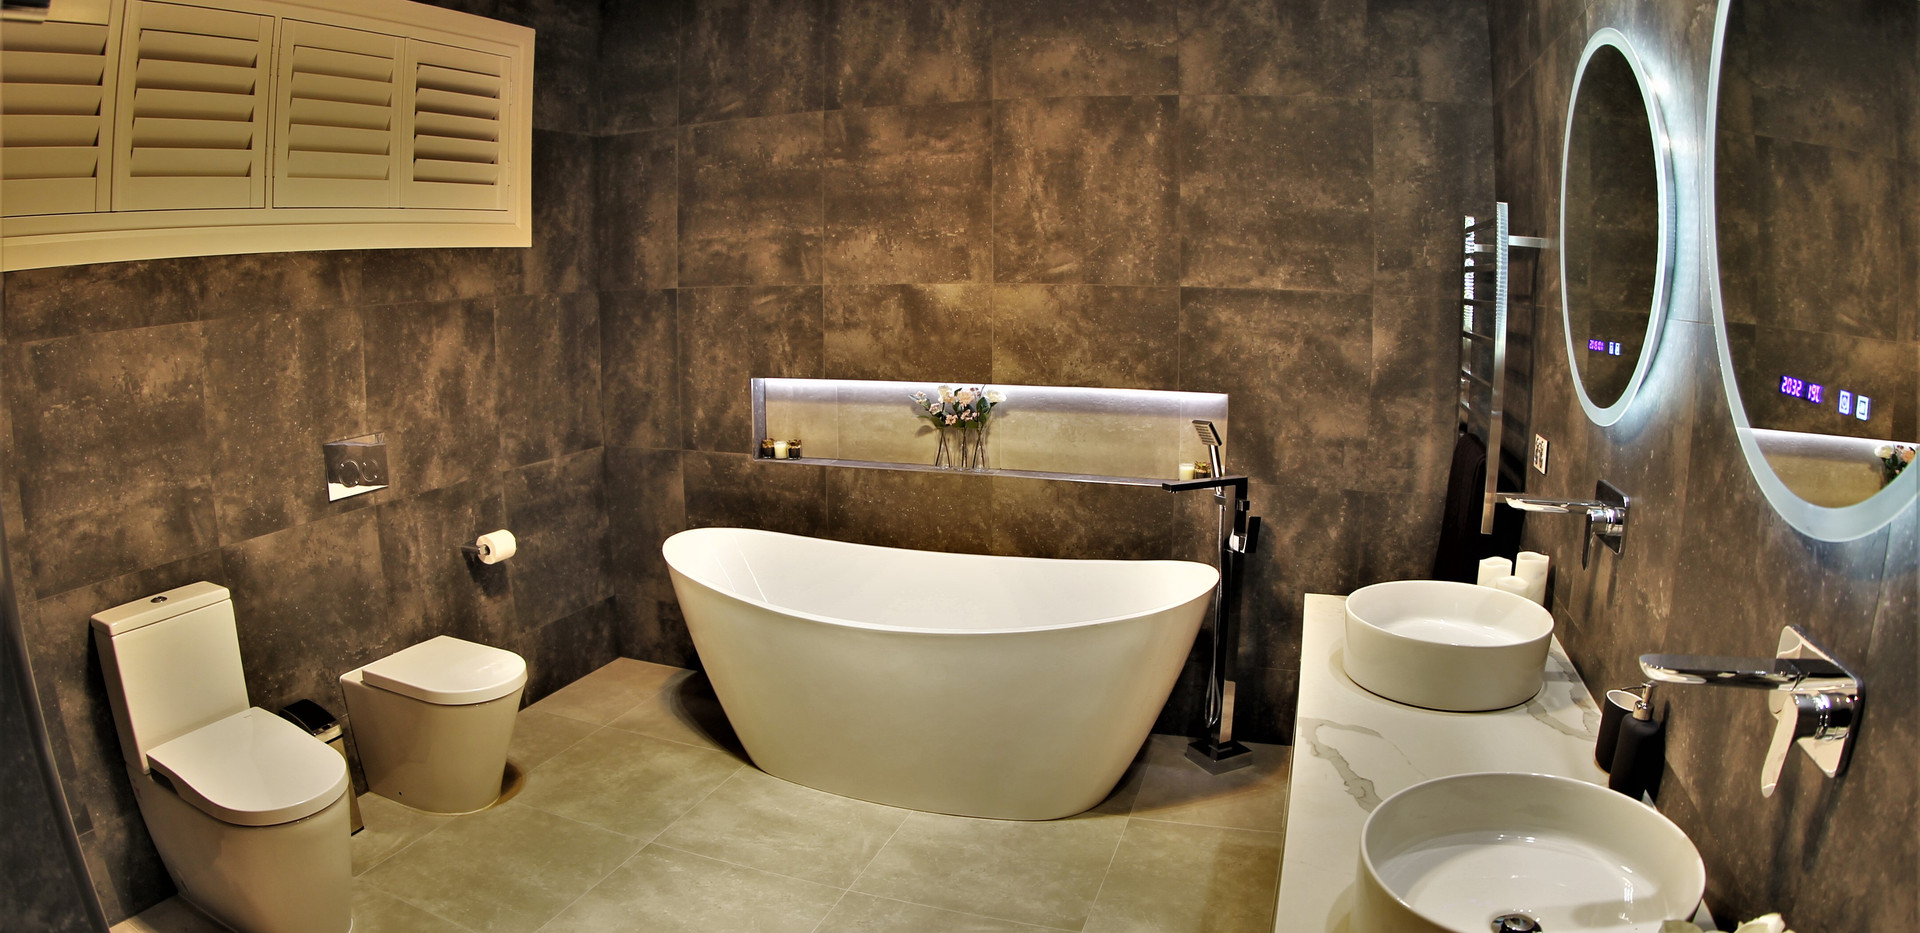 W.P Bath4.JPG